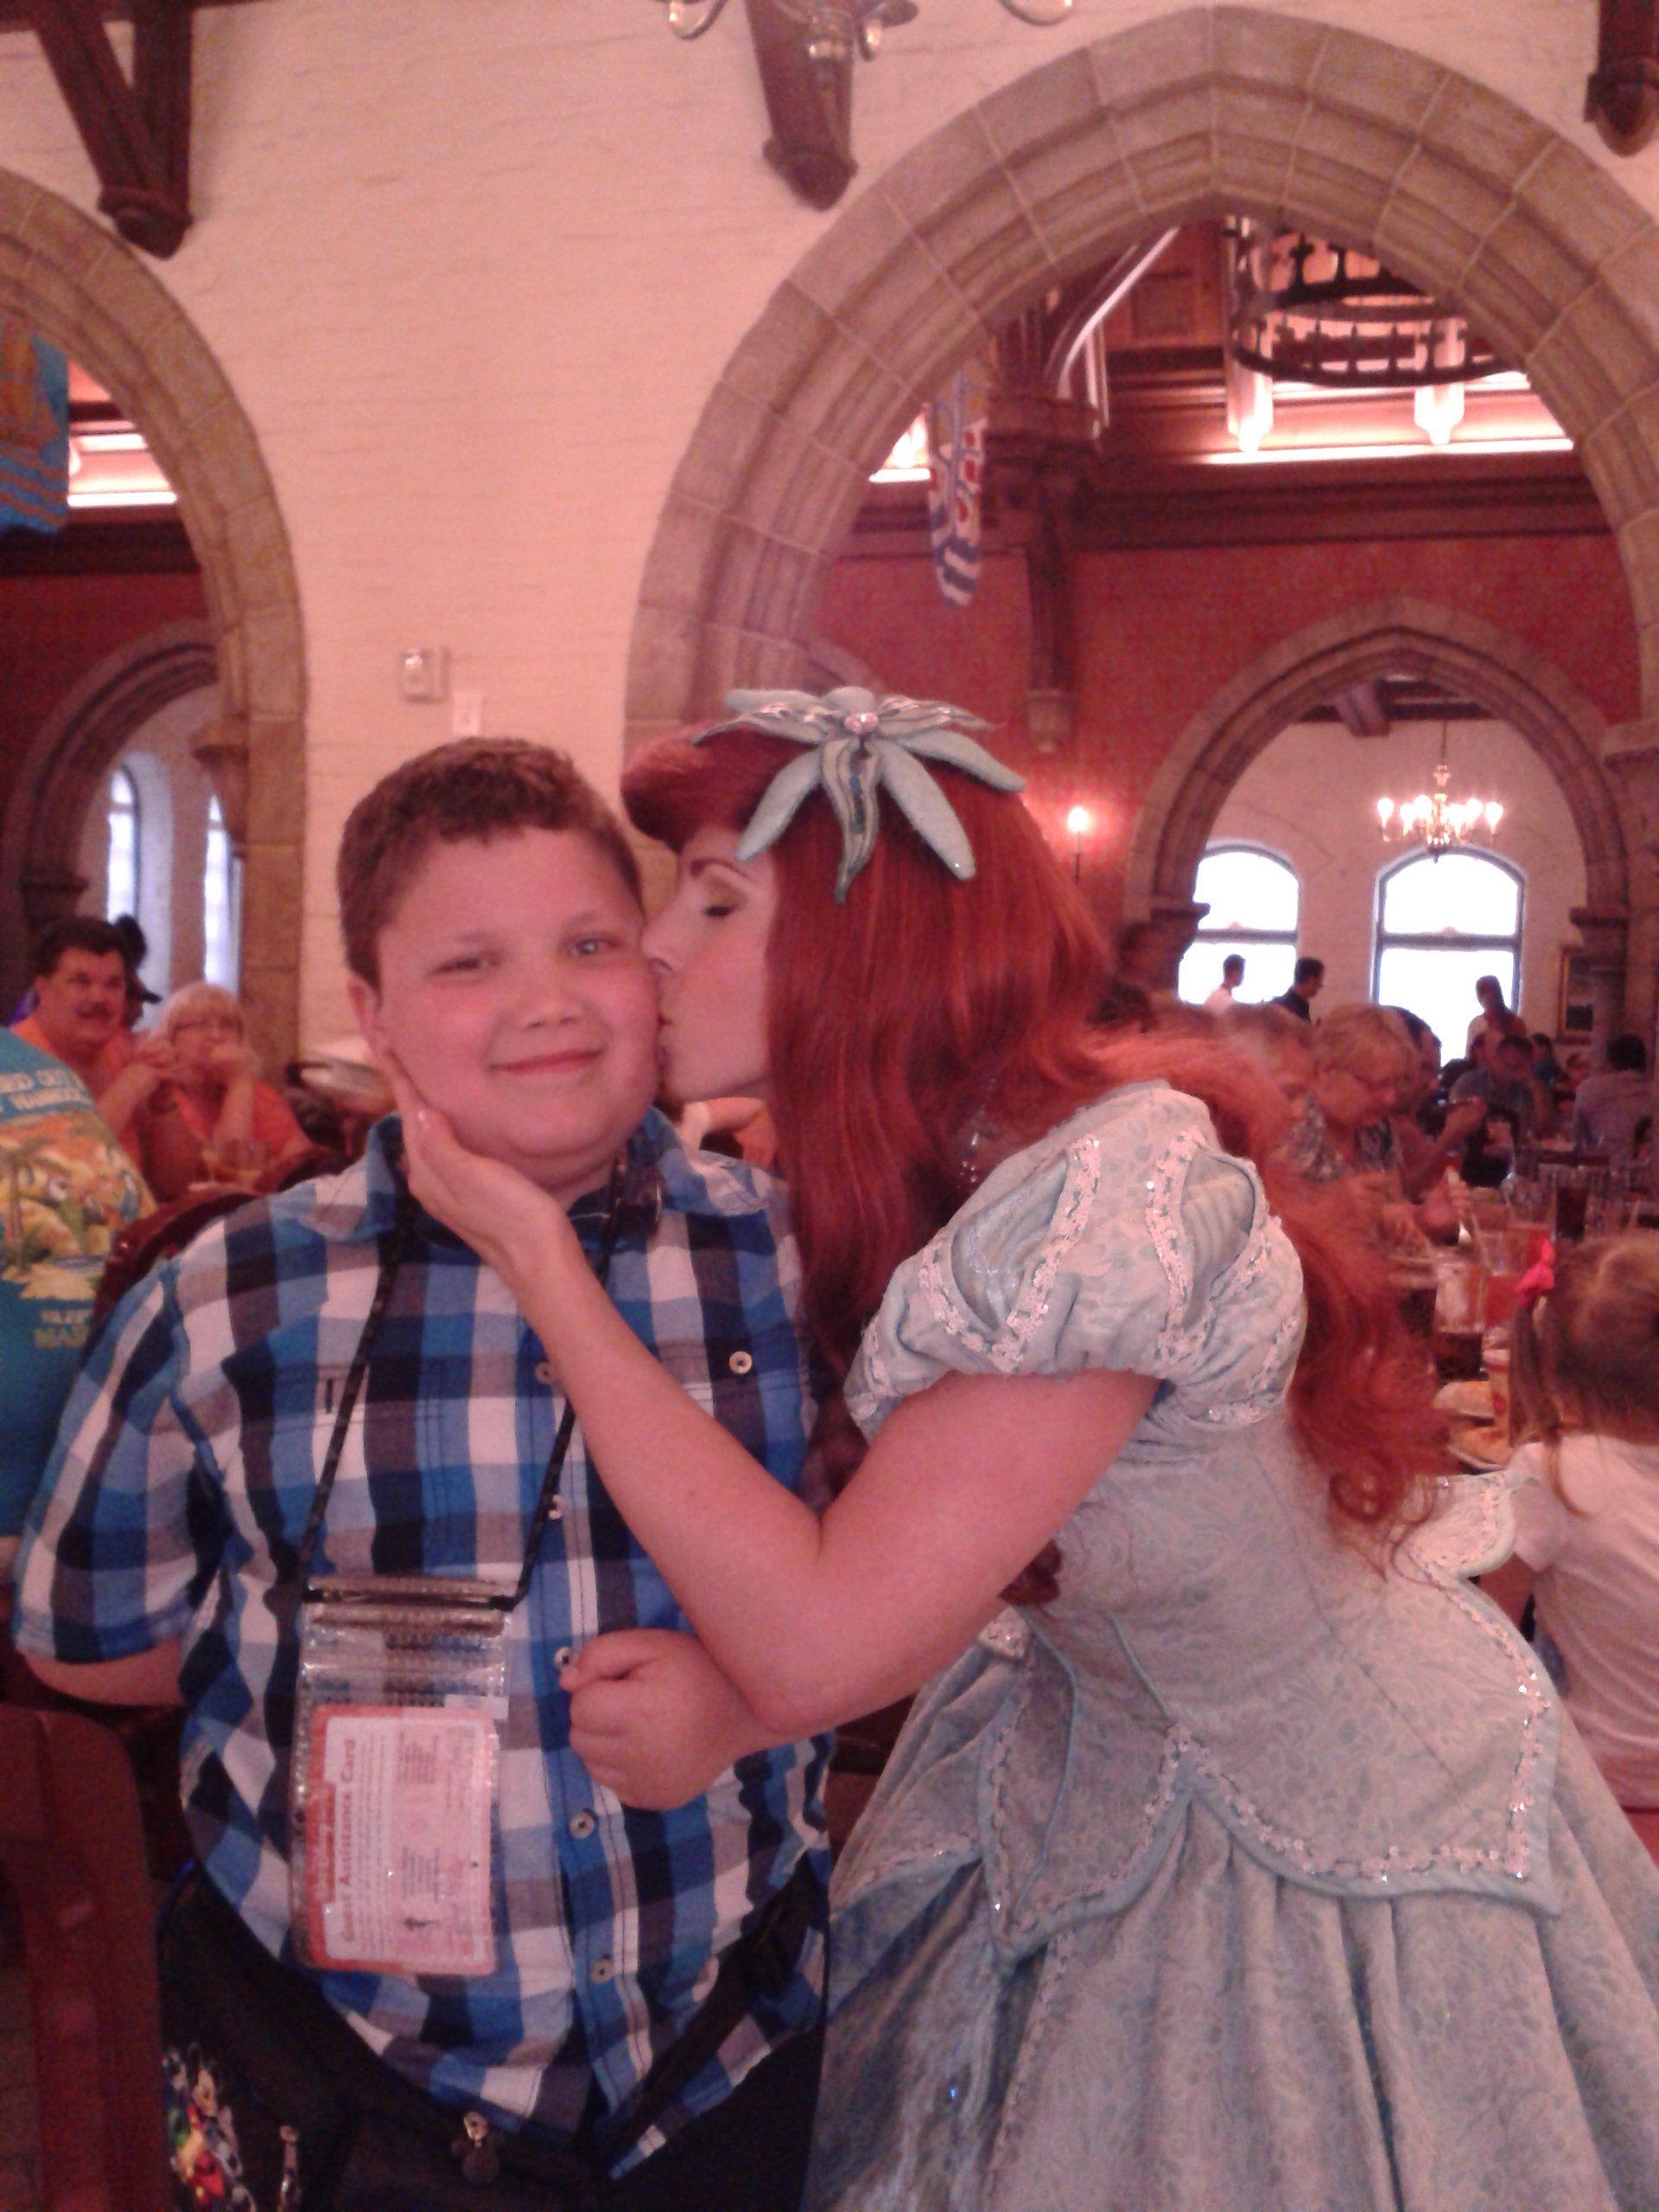 Princess Ariel Embarrassed The Boy Child She Even Left A Lipstick